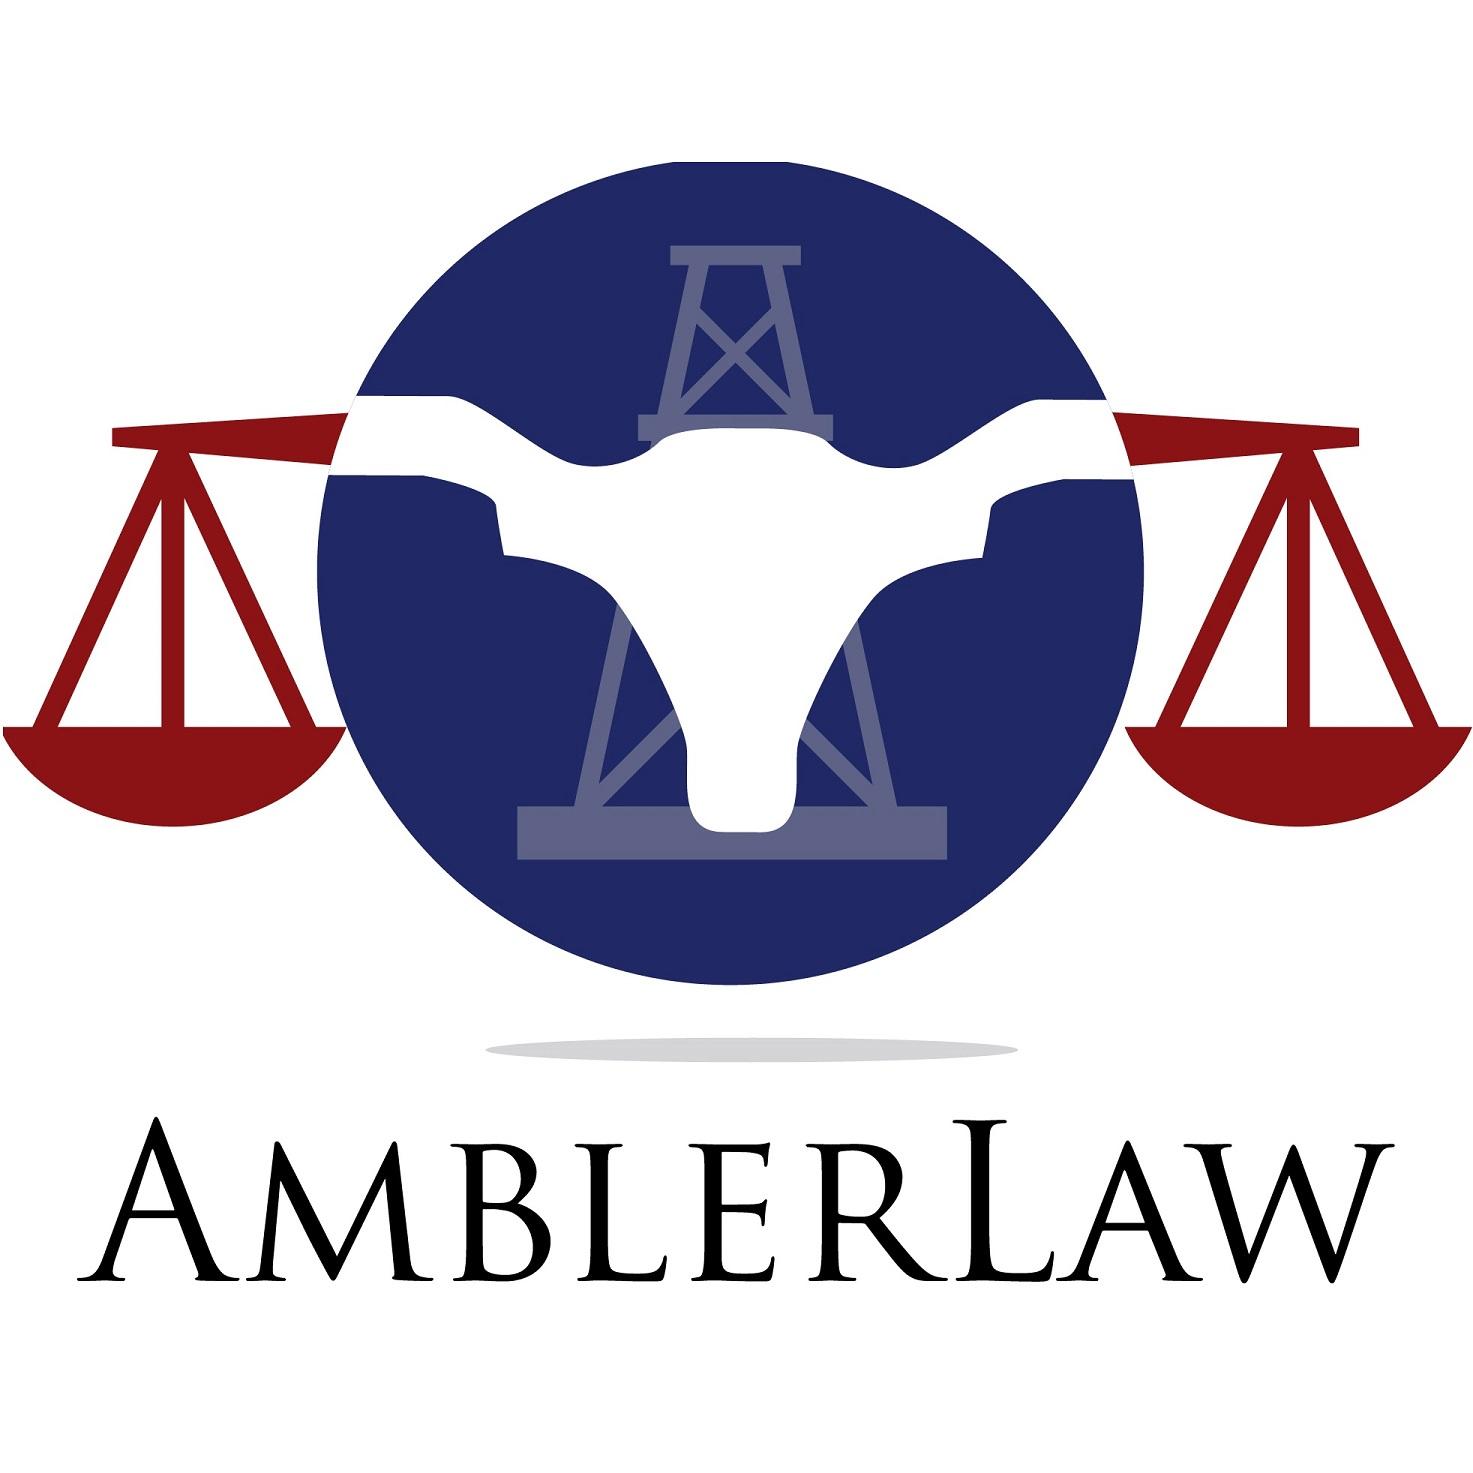 AmblerLaw